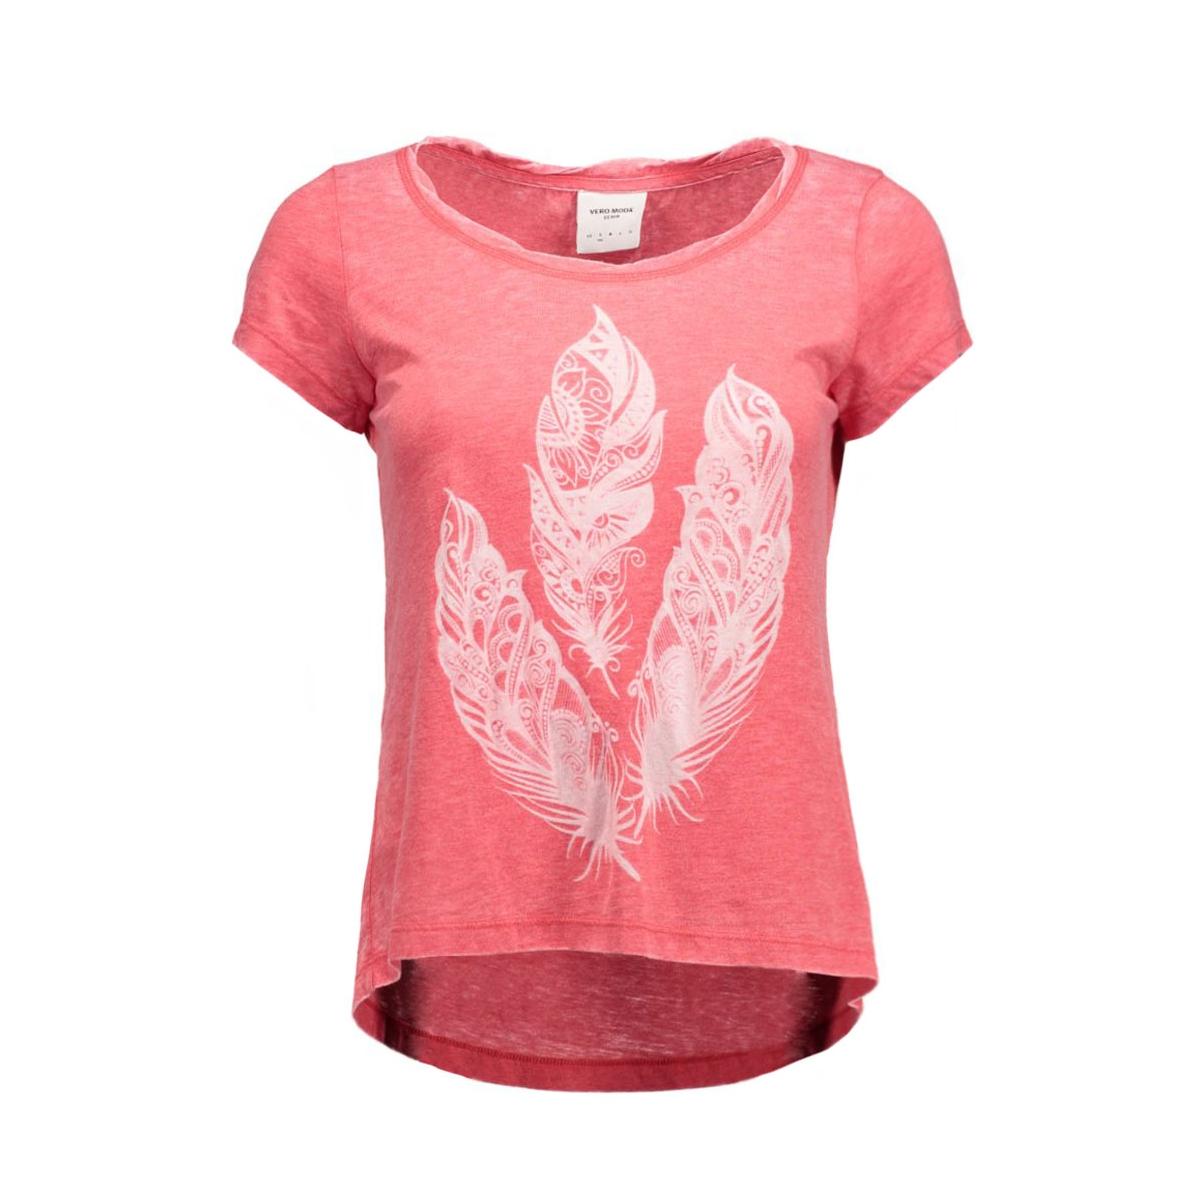 vmmoog molly animal ss top box dnm 10162155 vero moda t-shirt scarlet/melange w